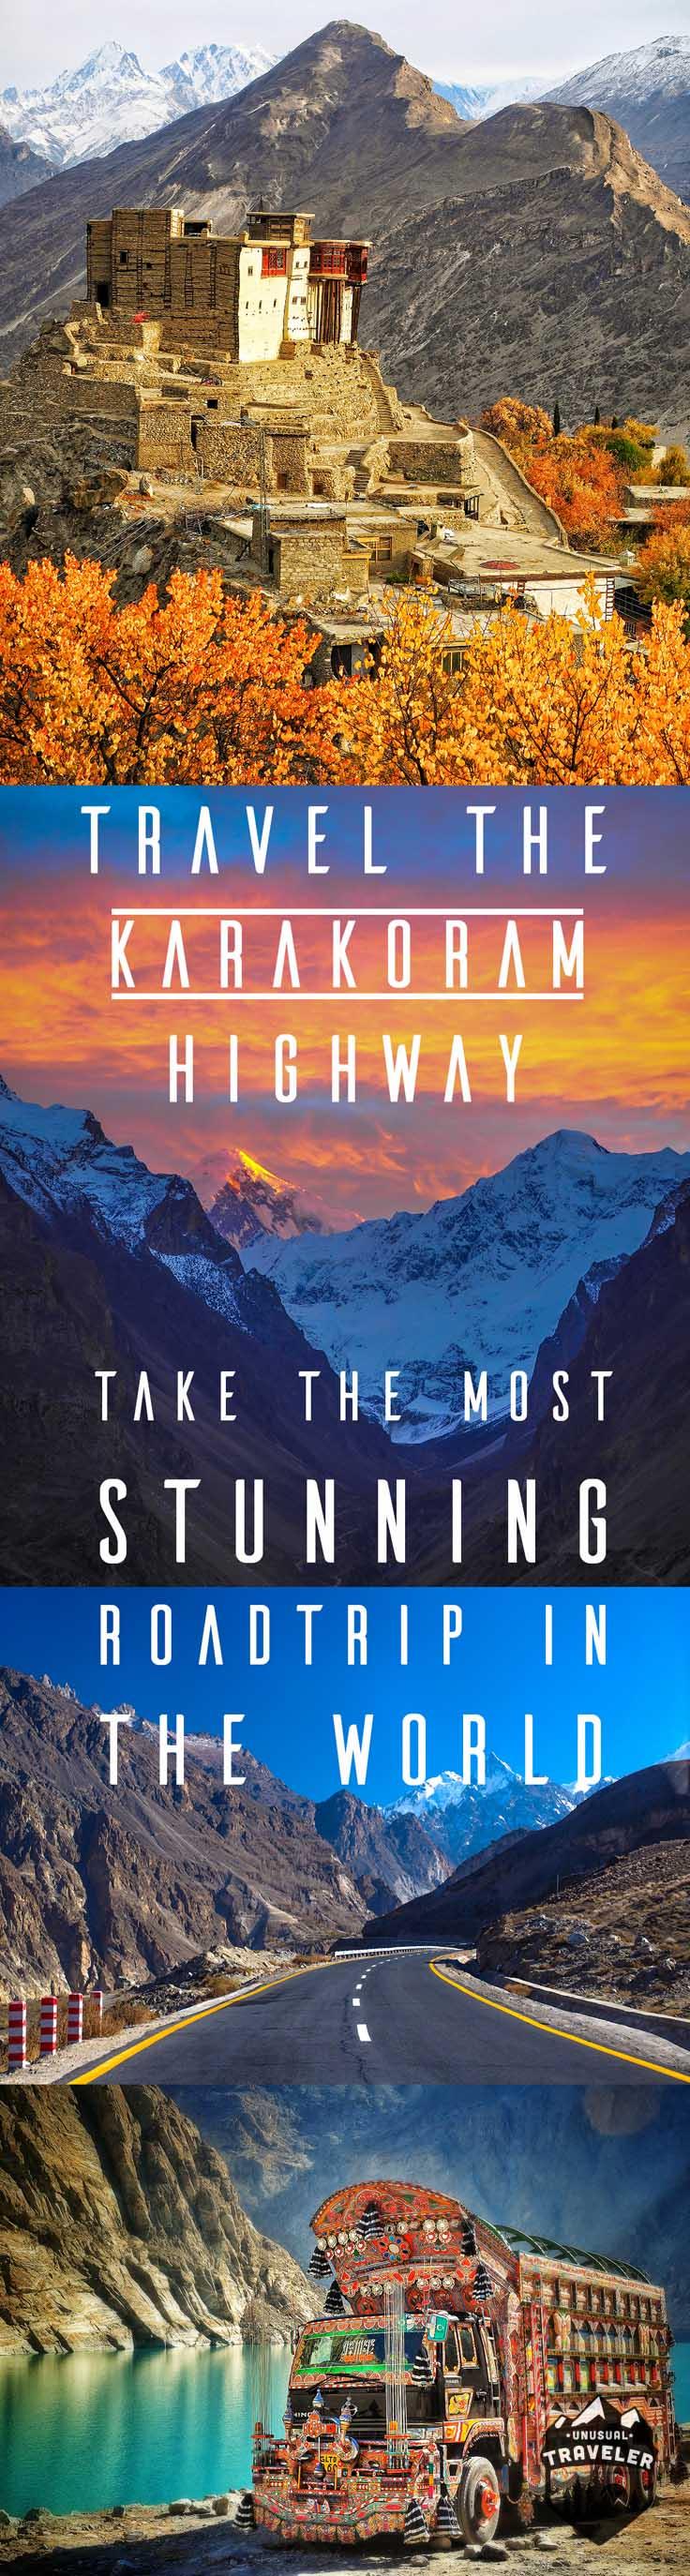 Karakoram Highway Road Trip Travel Guide